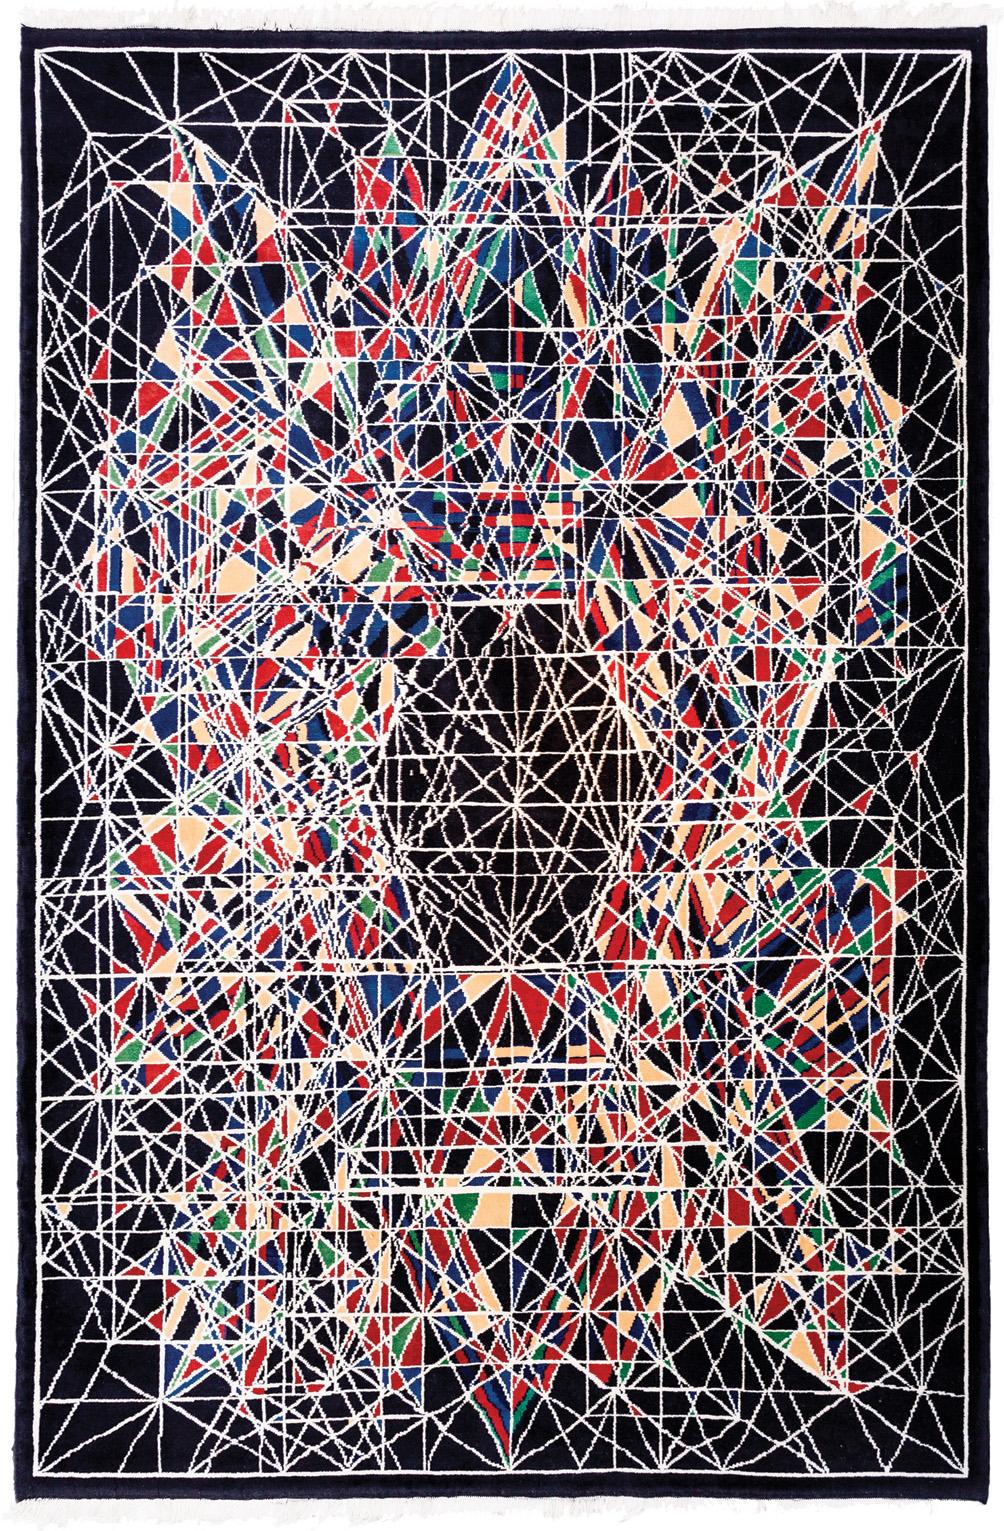 "'The Moon' carpet by Viron Erol Vert sized 2.21m x 3.25m (7'3"" x 10'8""), circa 2012. | Image courtesy of Viron Erol Vert."